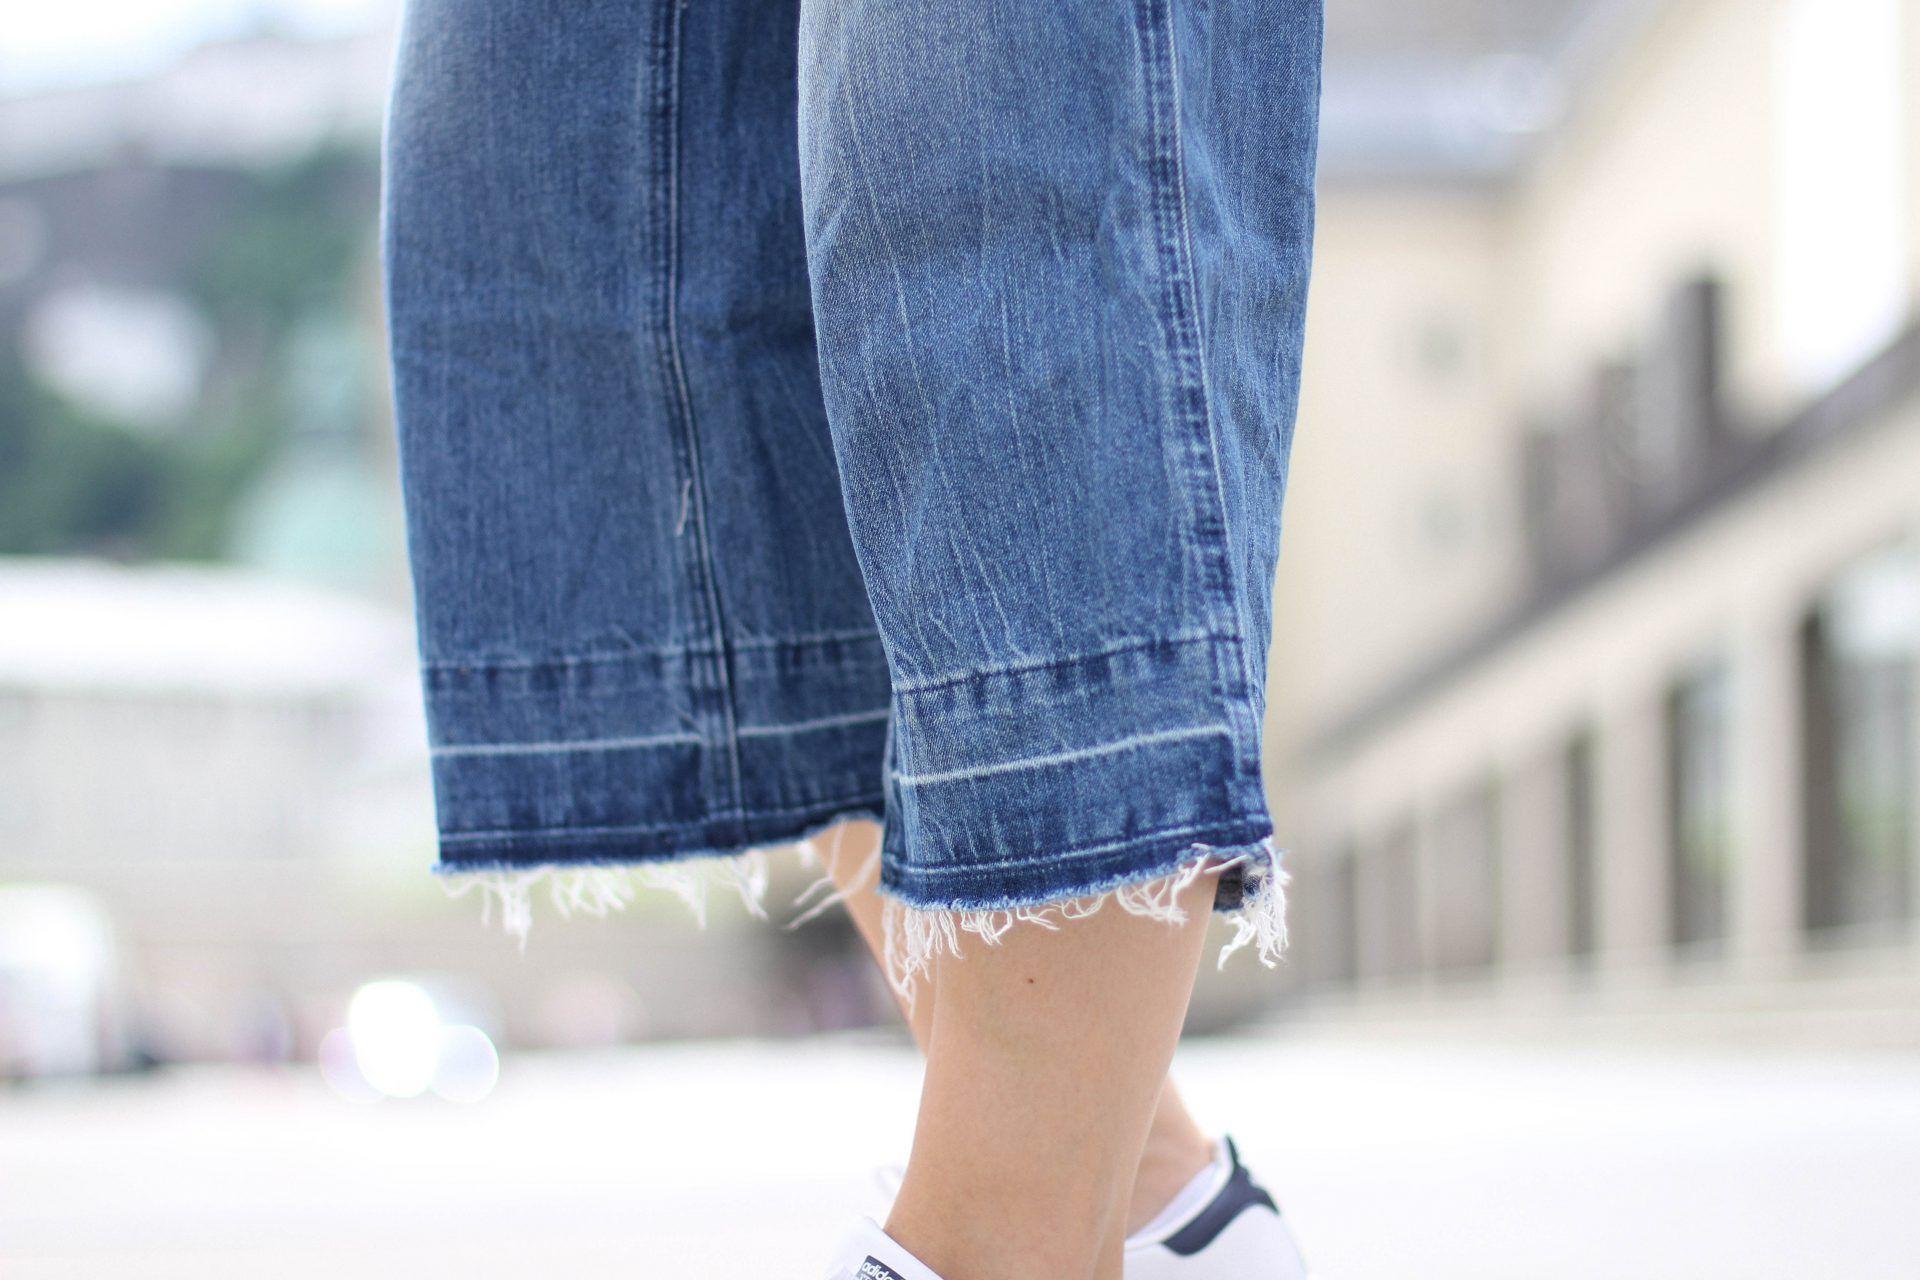 competitive price 8ab29 99356 tifmys – Vero Moda culottes & Adidas Stan Smith sneakers ...